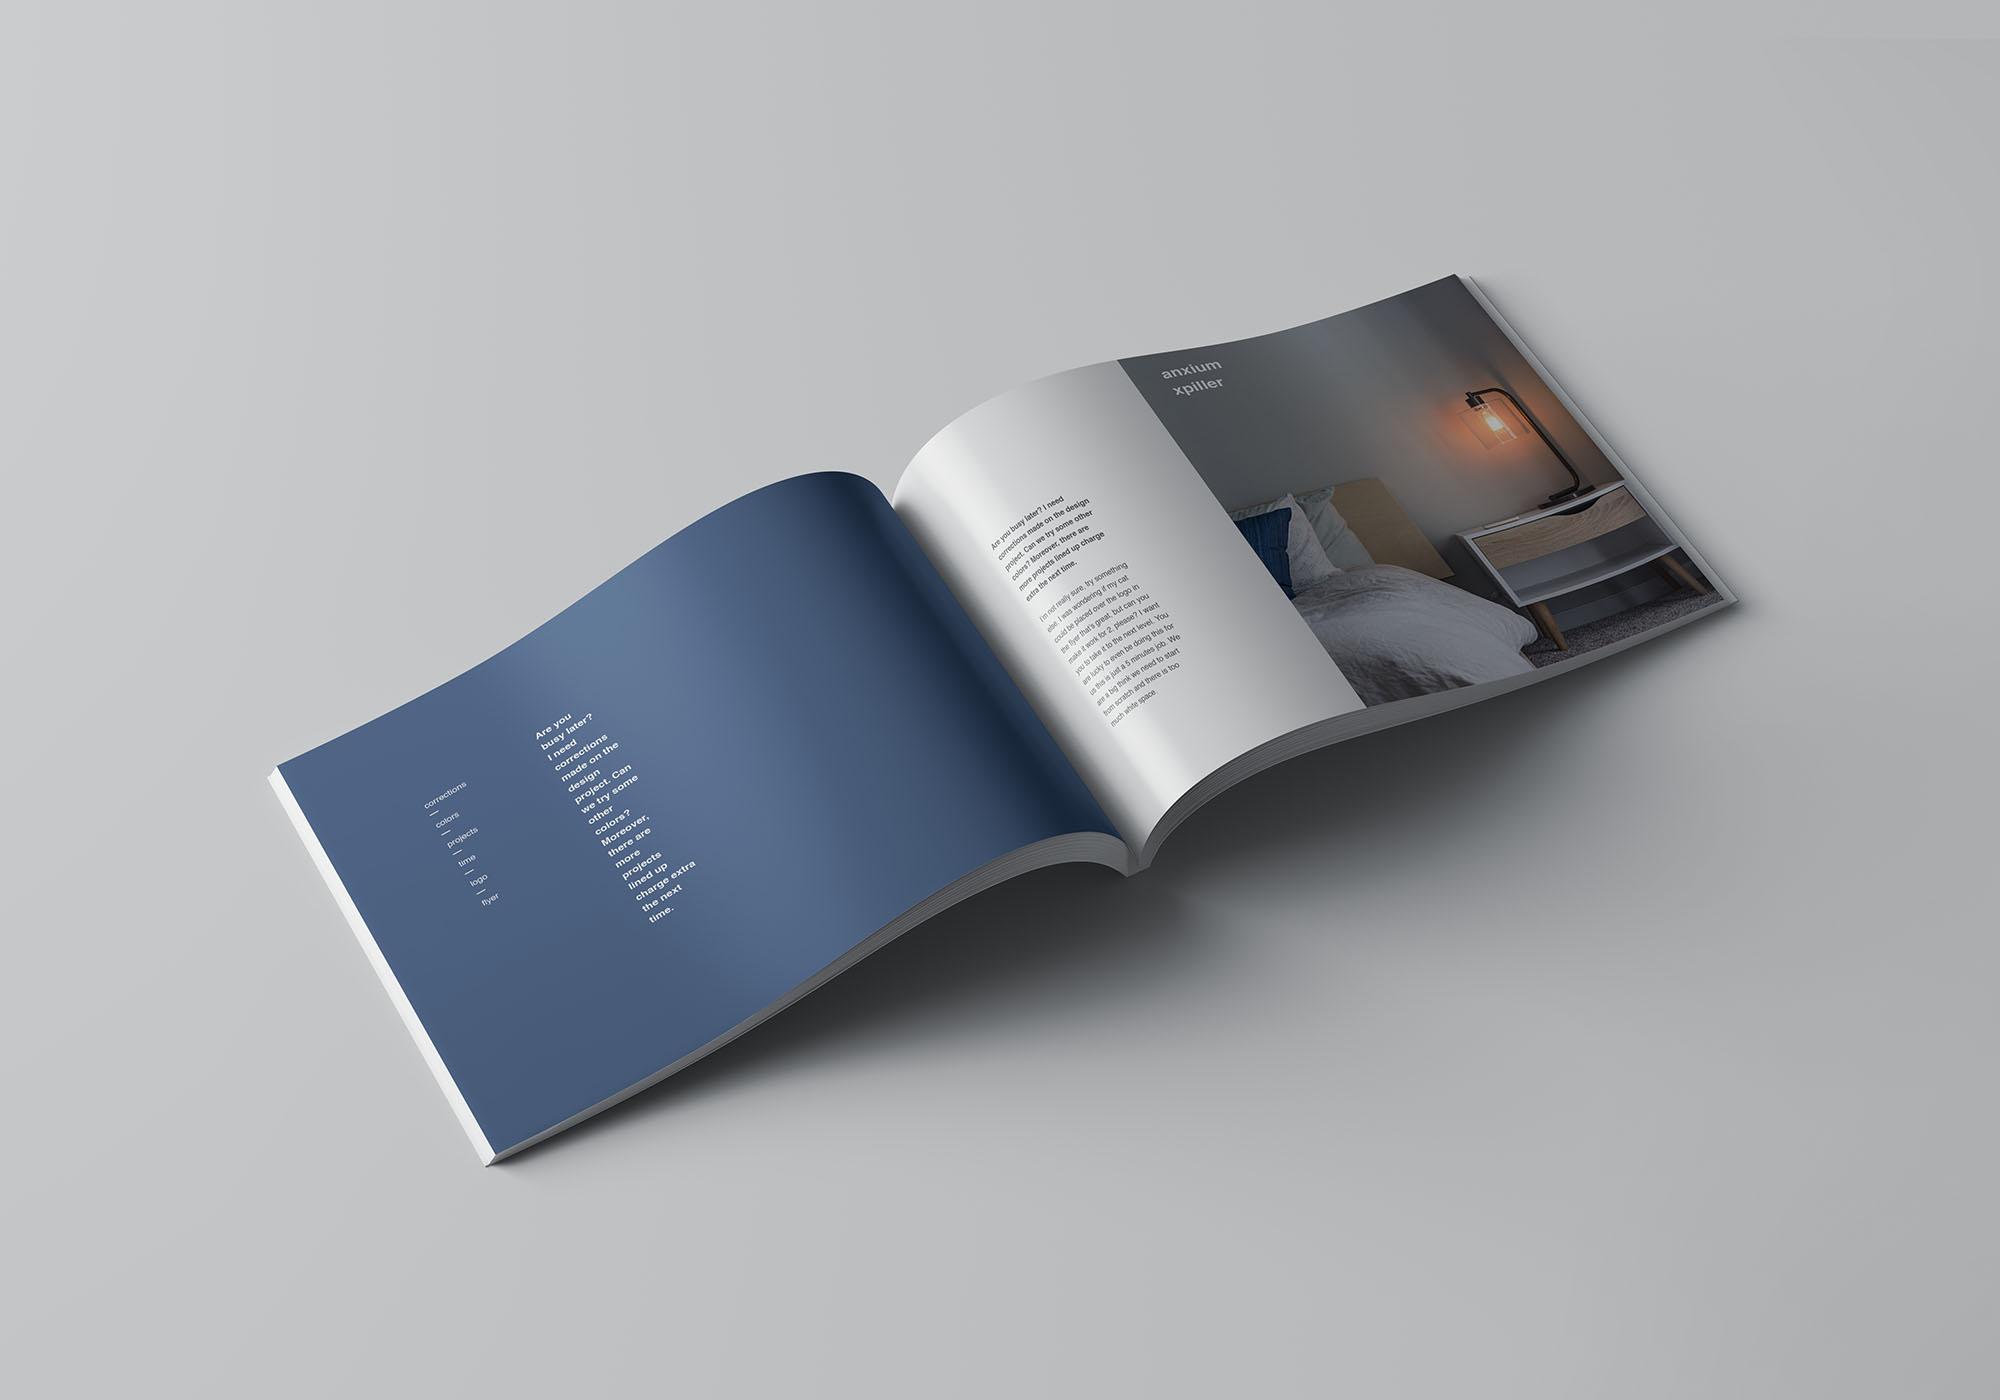 A4书籍画册杂志设计效果图样机模板 A4 Landscape Perfect Binding Brochure Mockup插图(3)